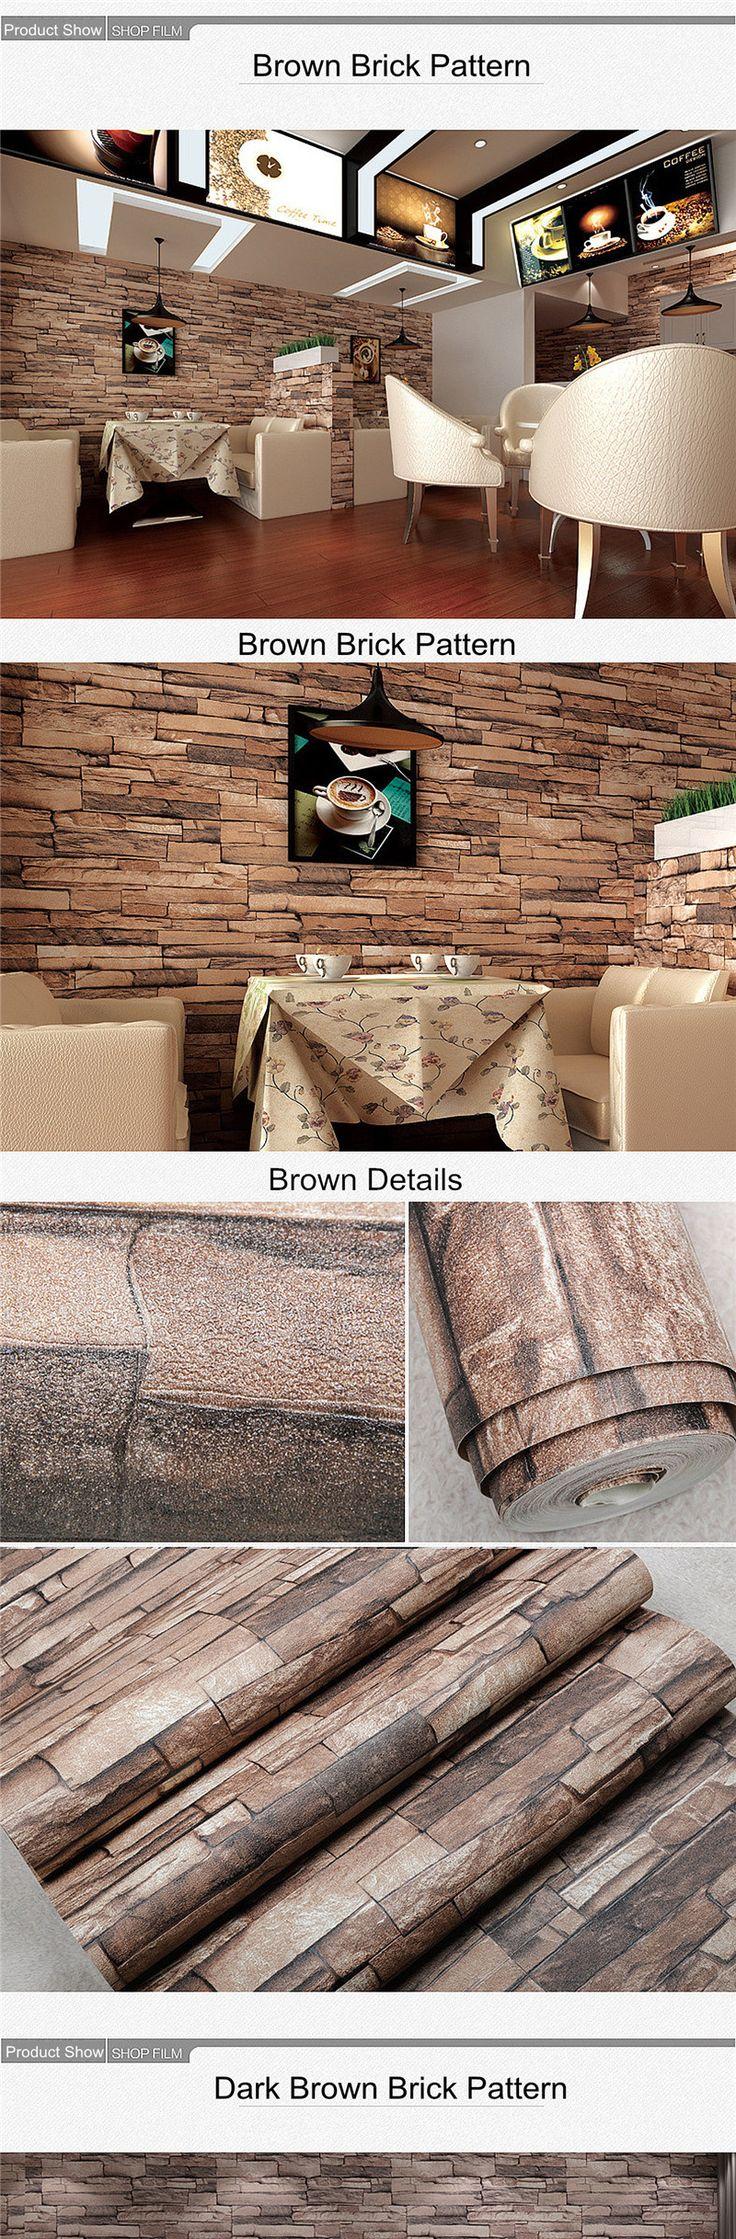 Realistic 3d illustration of modern wooden bookshelf against ston - 10m 3d Wallpaper Roll Pvc Brick Grain Waterproof Wallpaper Natural Wood Pulp Dull Polish Wall Decor